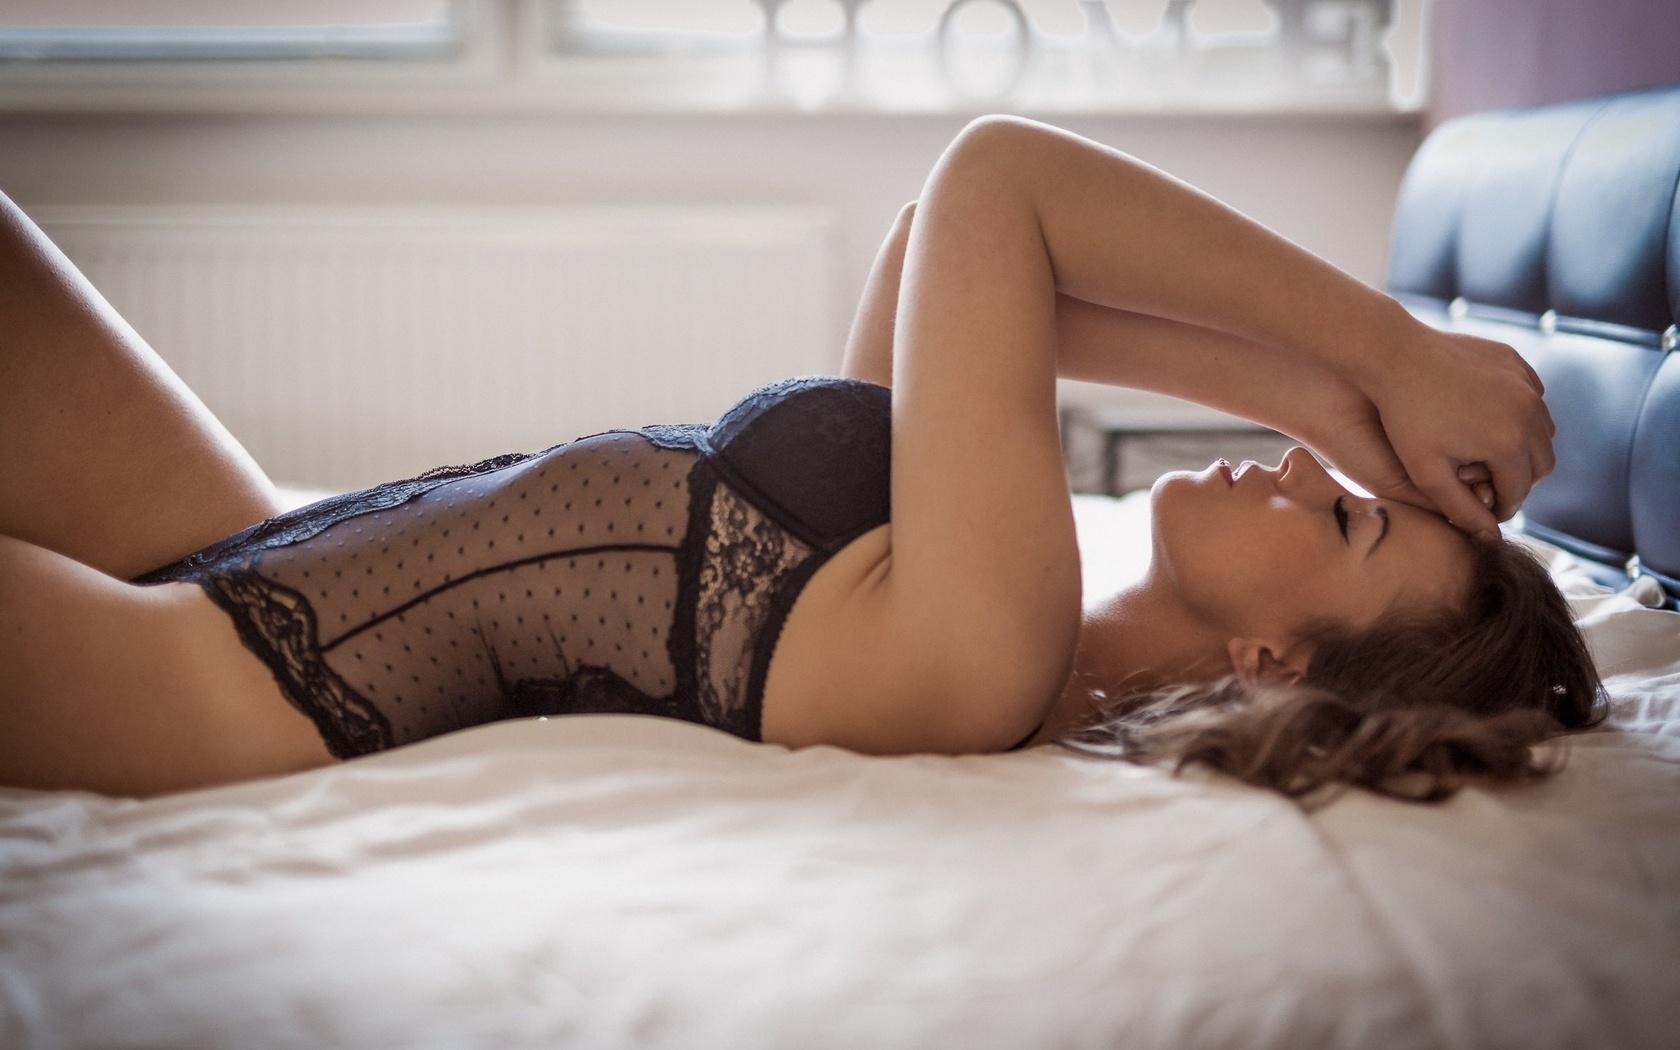 У девушки лежа видно нижнее белье фото — pic 13